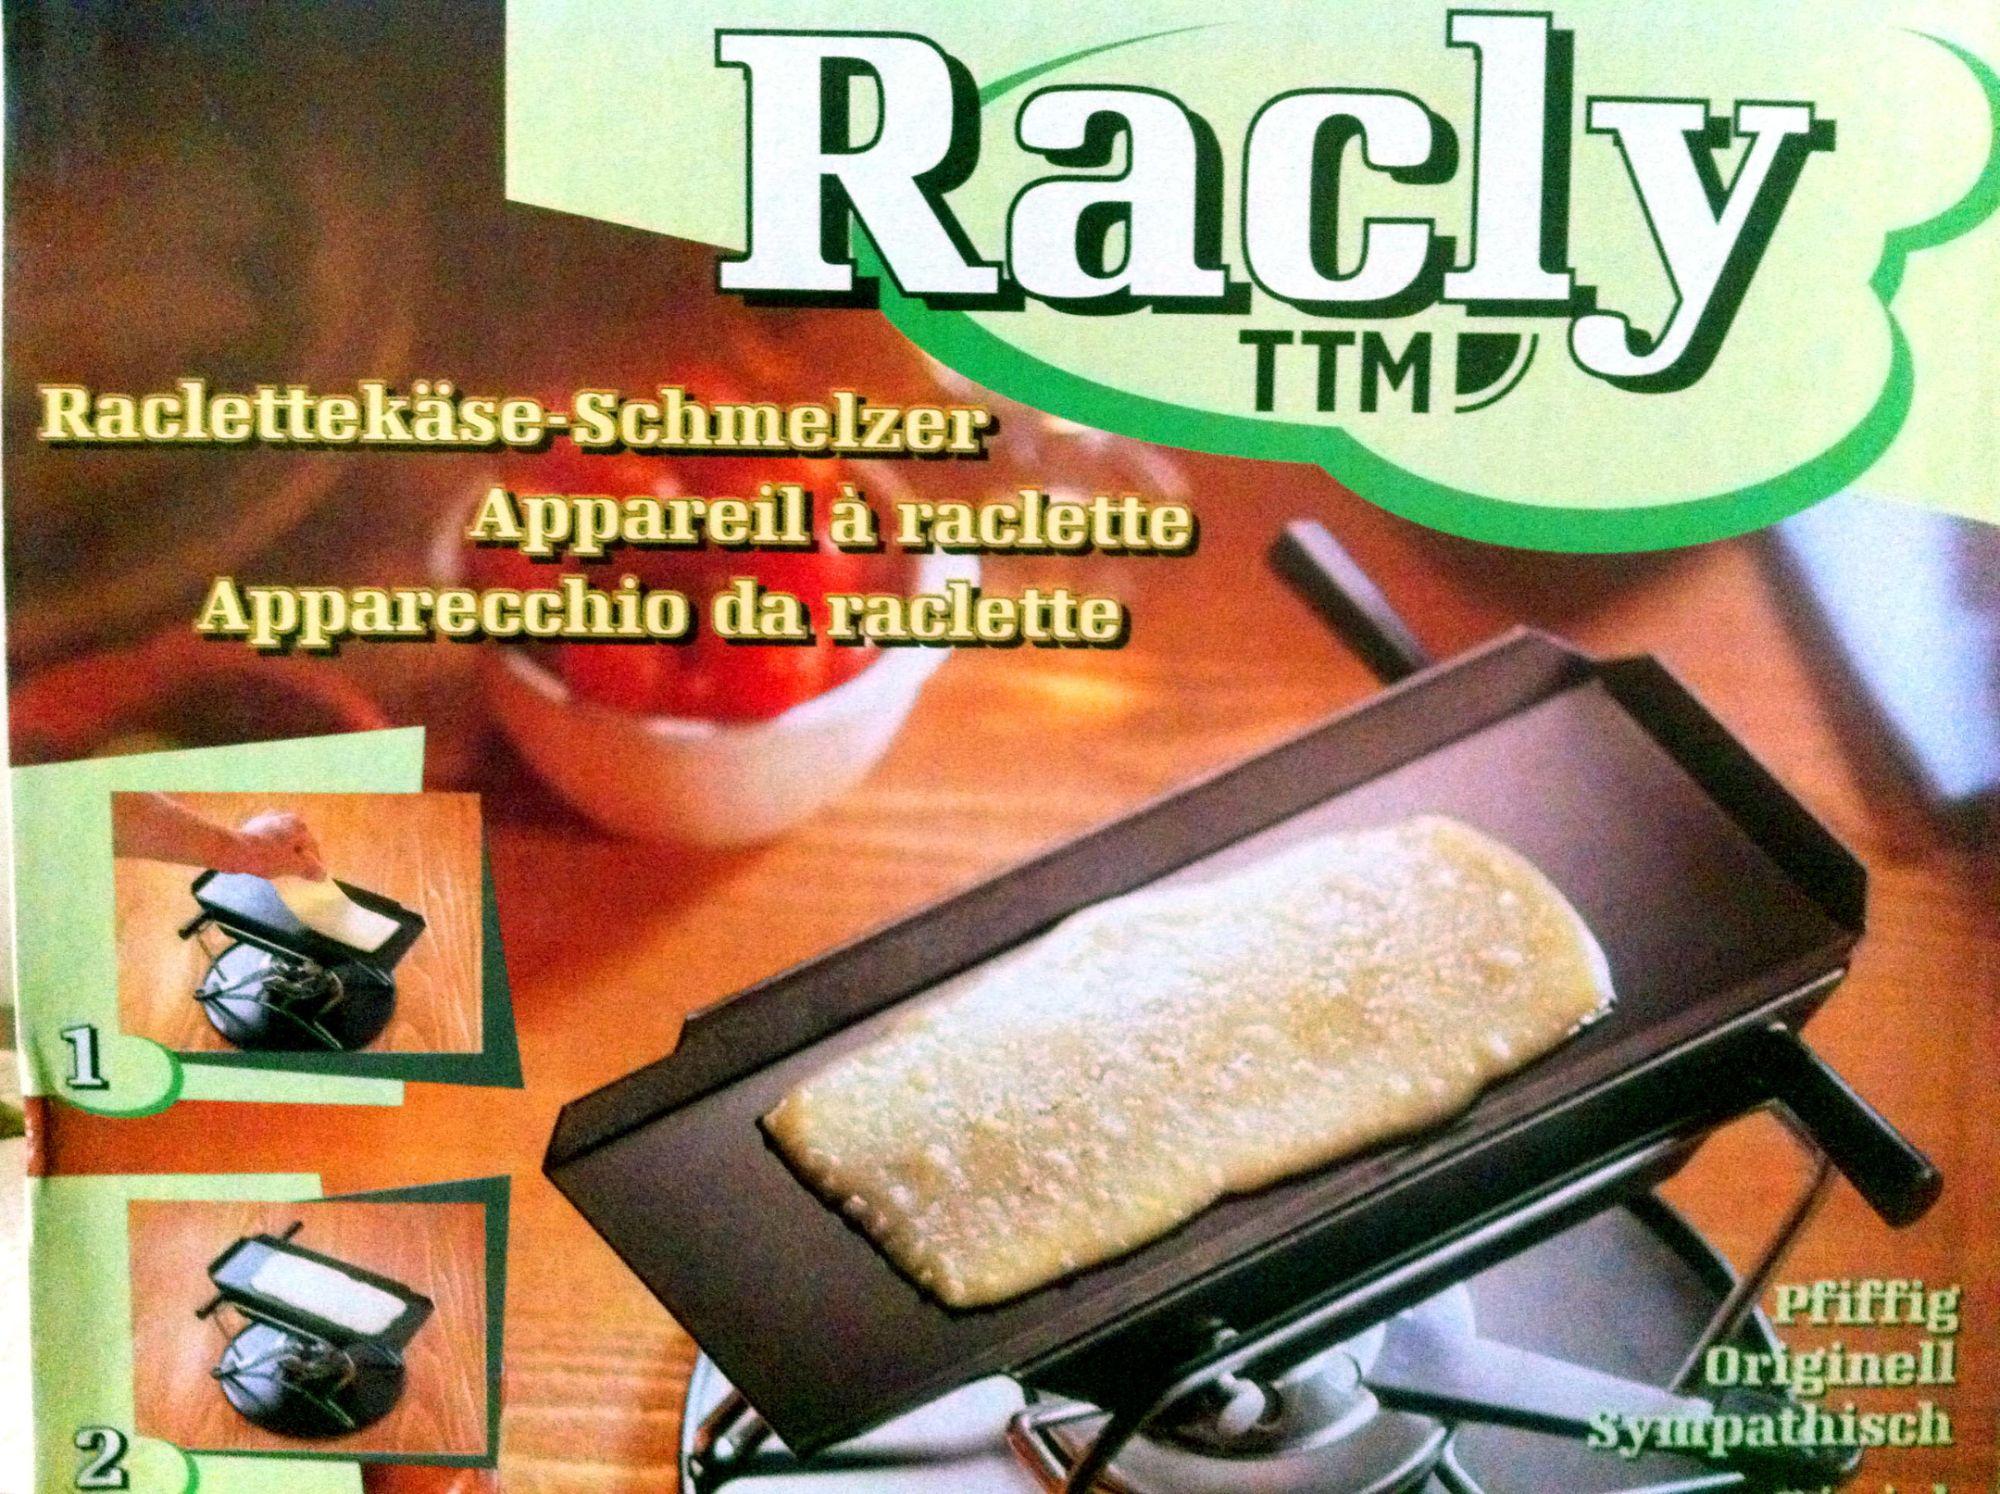 Bron raclette coucke raclette party ttm05 catgorie appareil raclette - Appareil a raclette demi meule ...